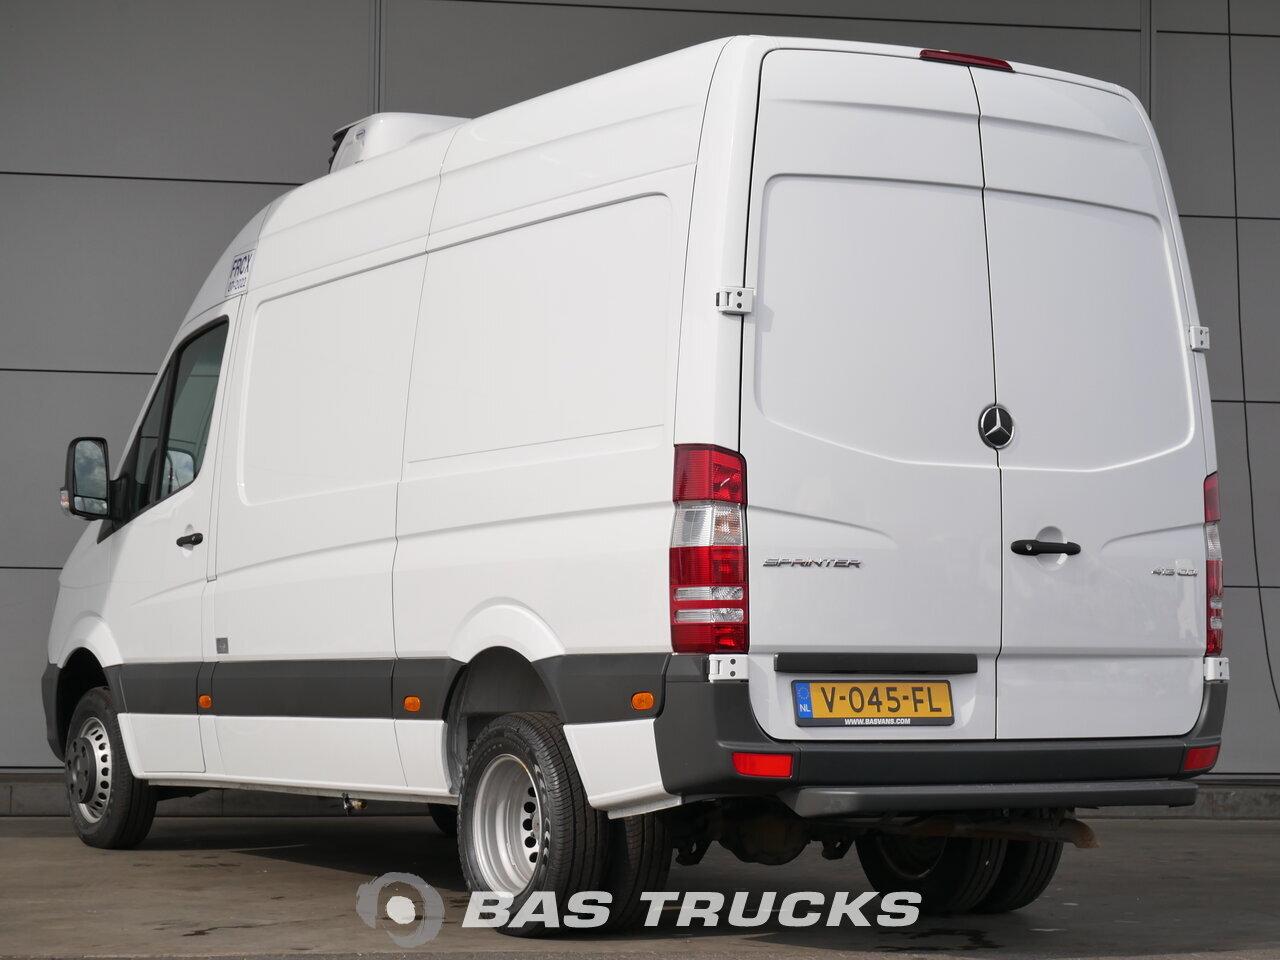 mercedes sprinter lcv euro 0 42900 bas trucks. Black Bedroom Furniture Sets. Home Design Ideas